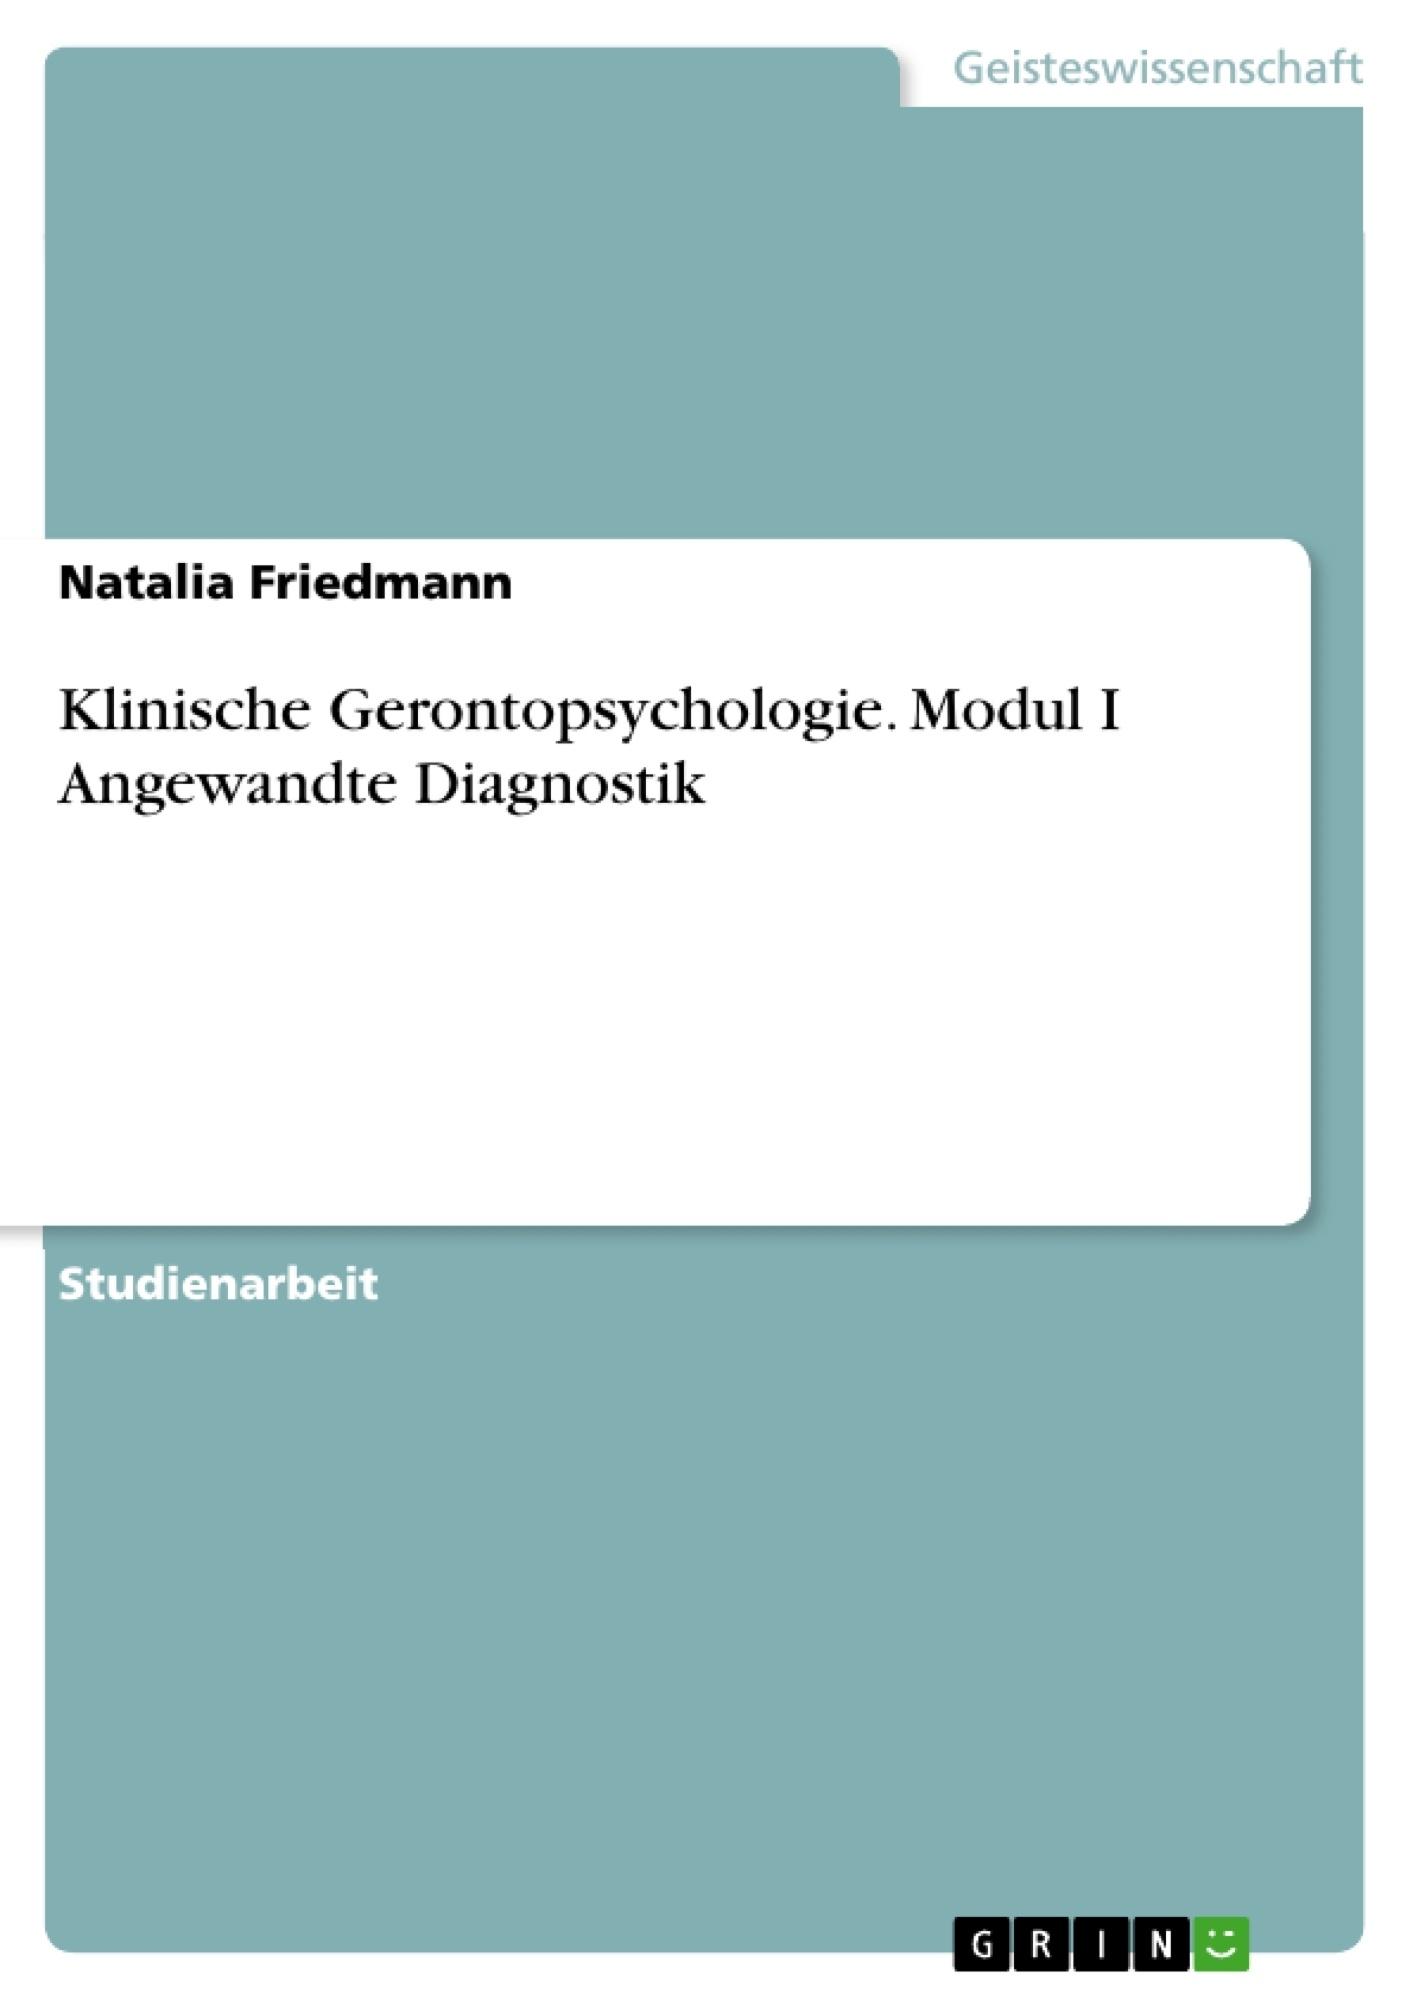 Titel: Klinische Gerontopsychologie. Modul I Angewandte Diagnostik